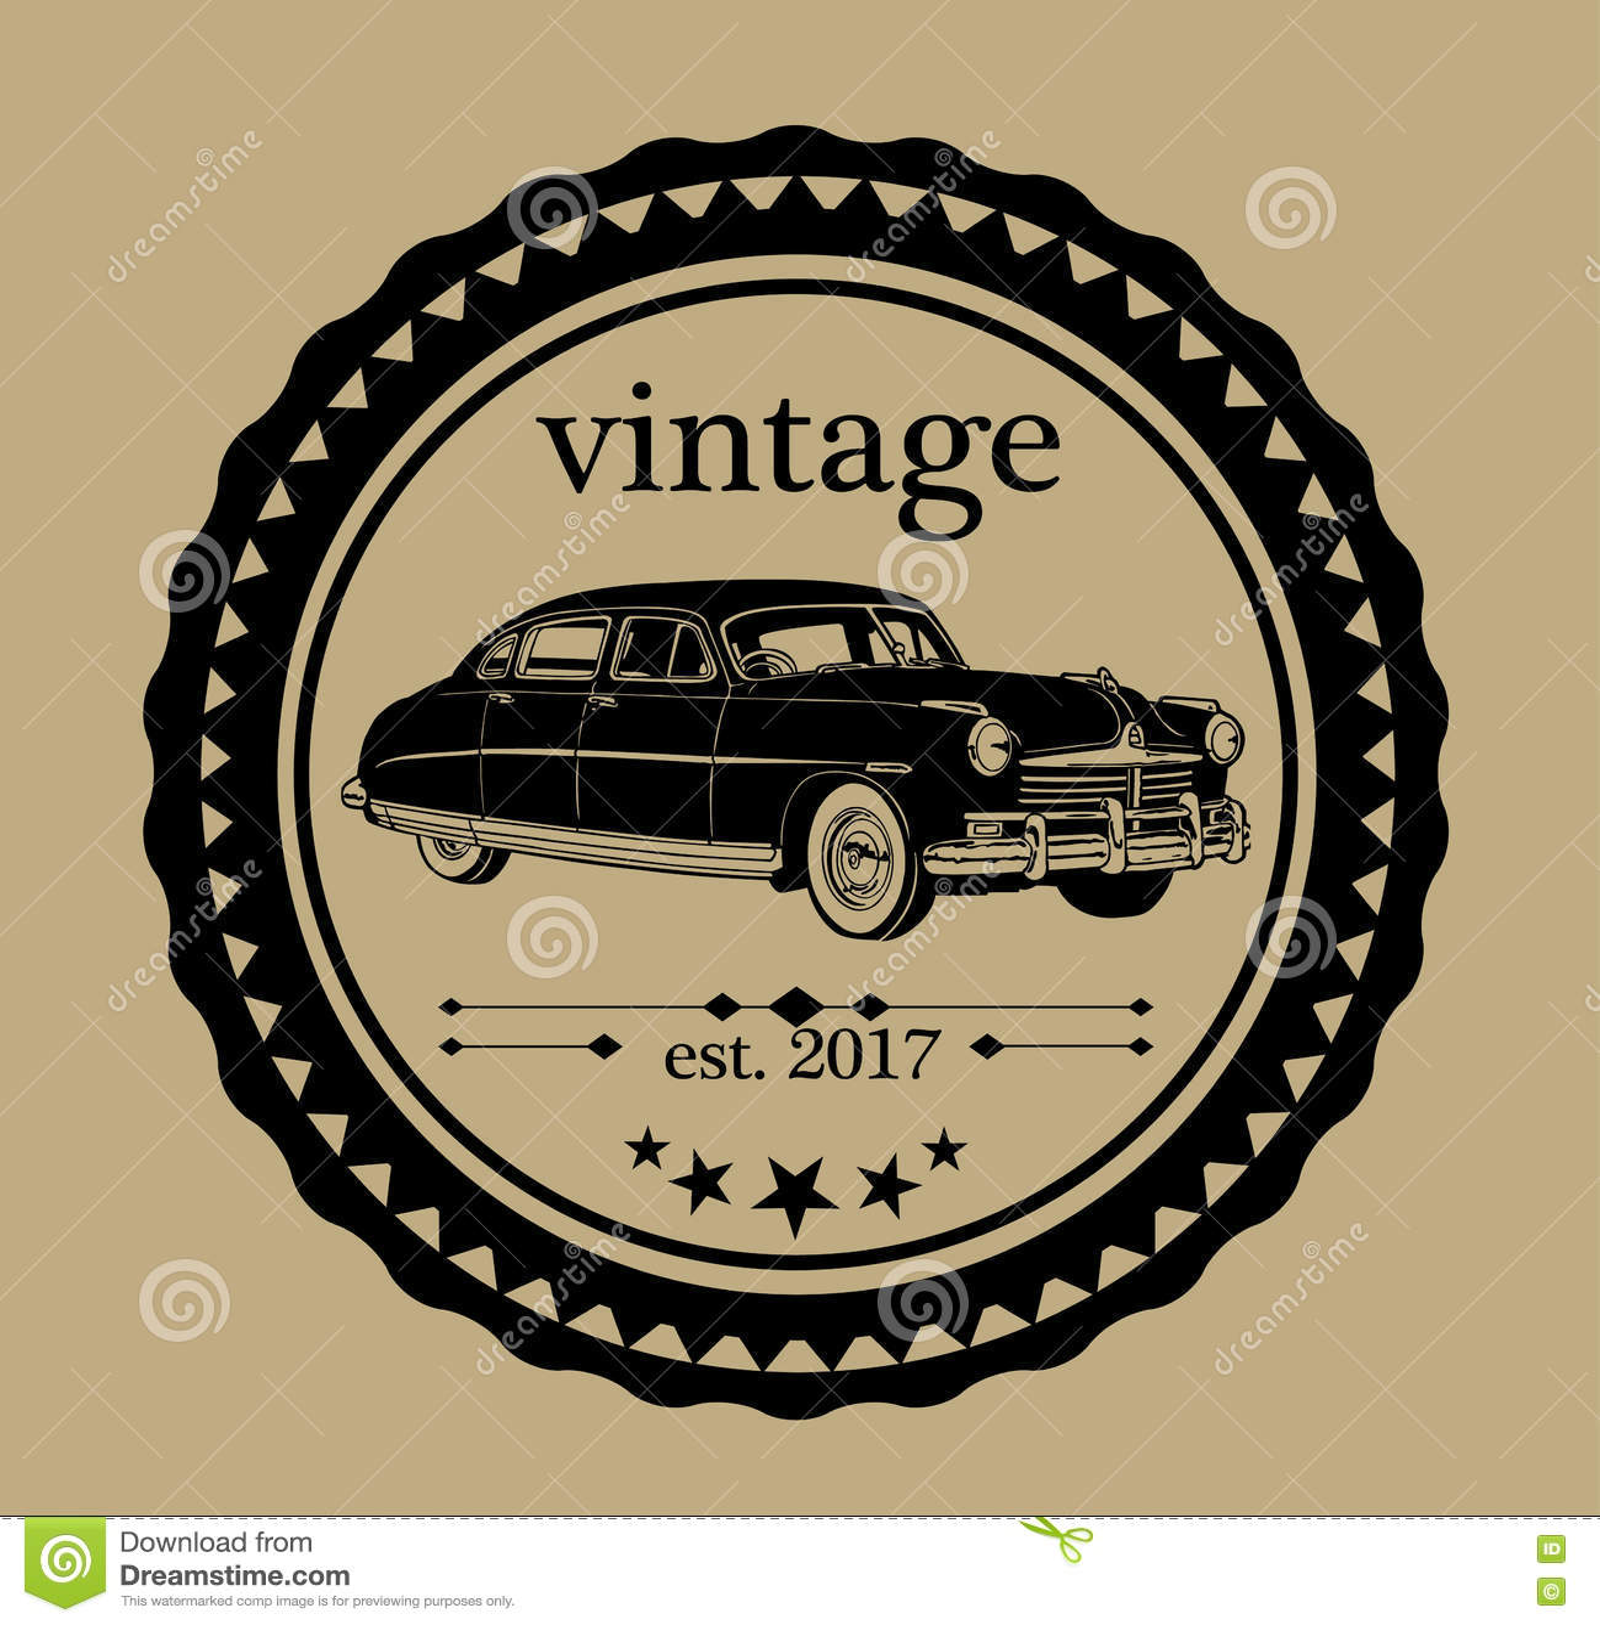 Vintage Car Logo Stock Vector Illustration Of Drive 77276876